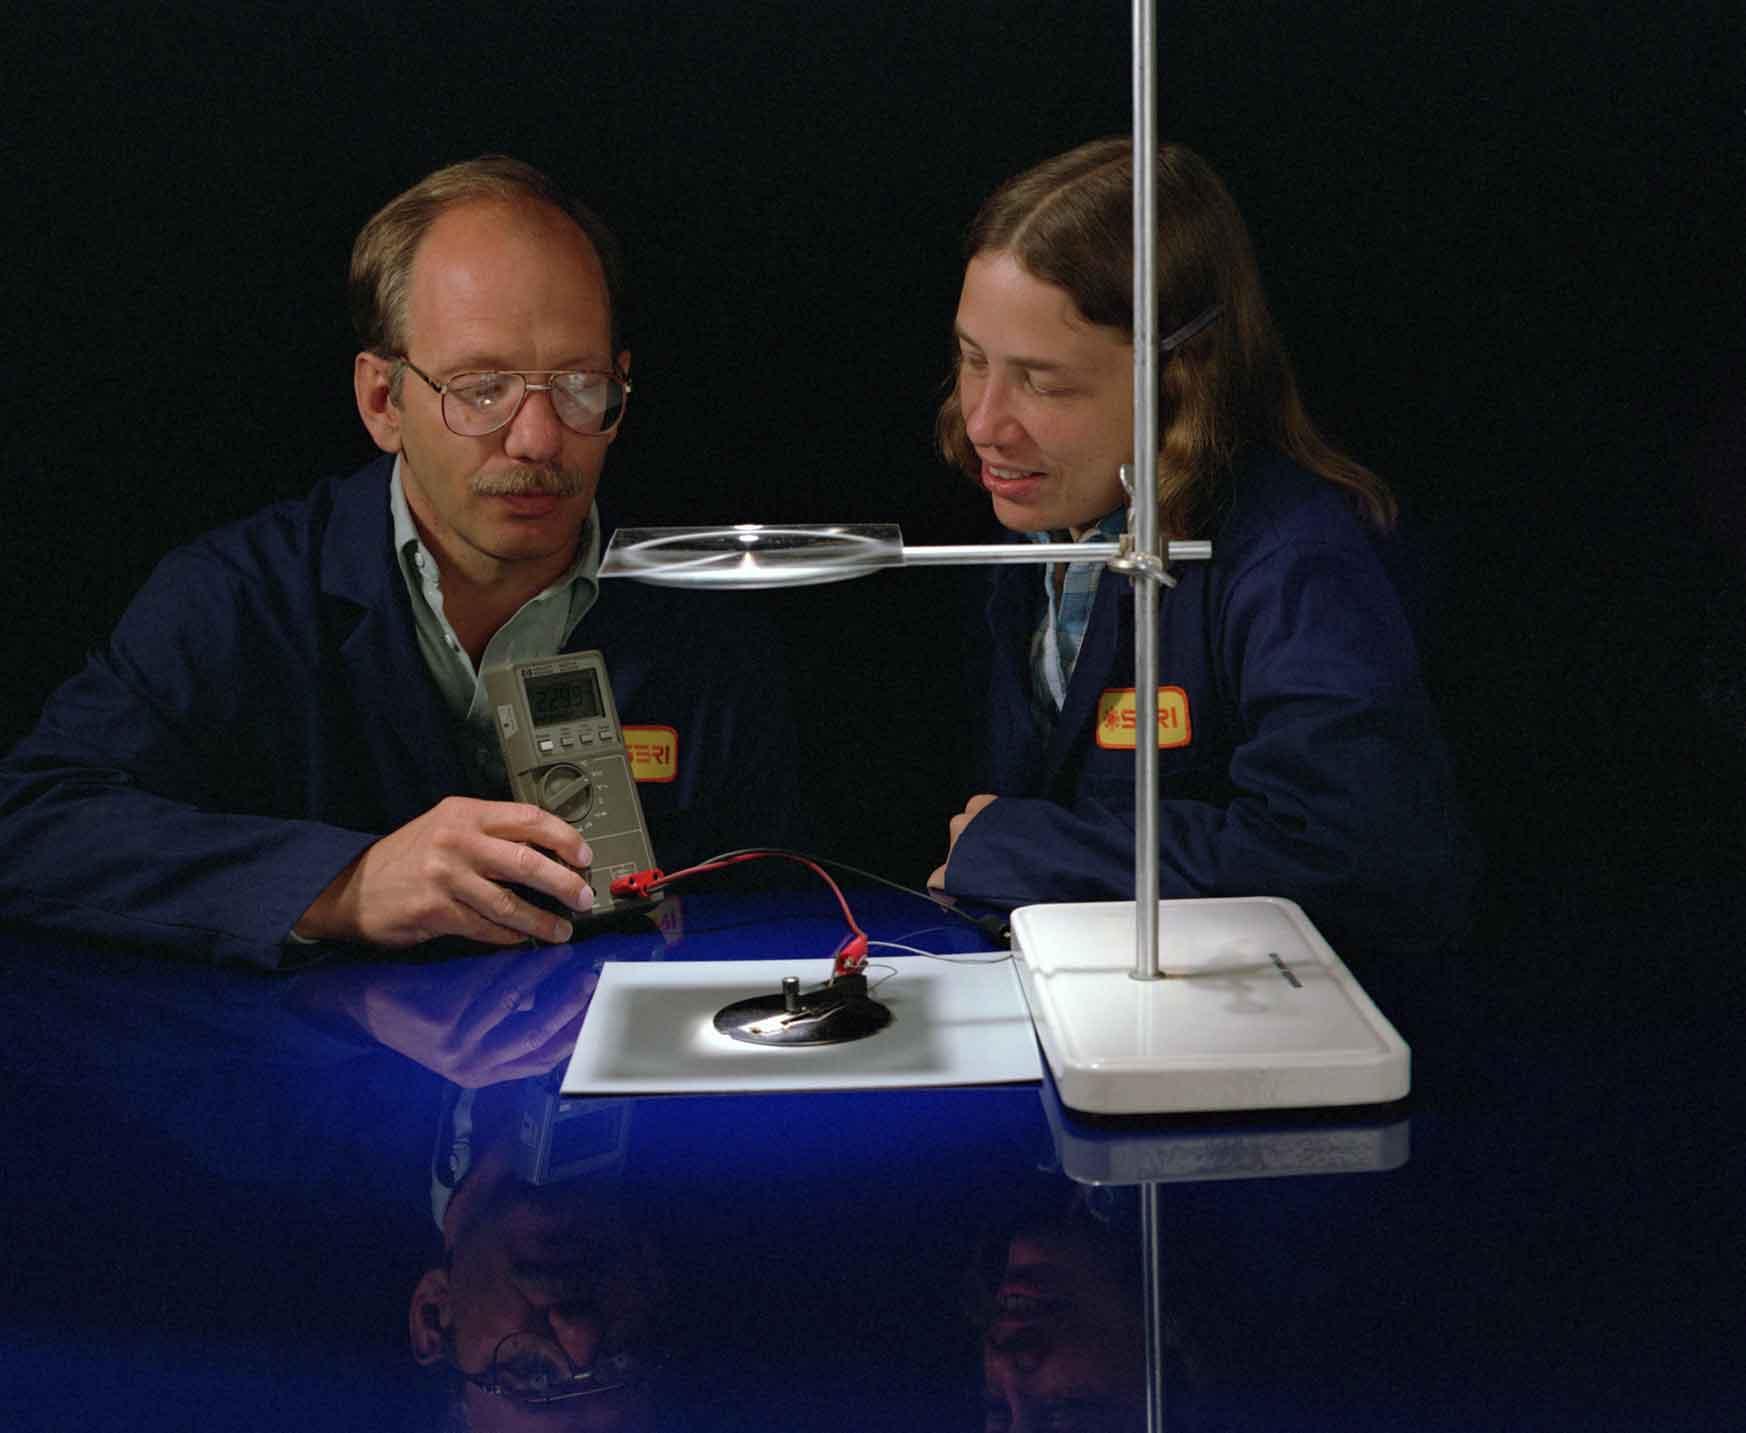 NREL-1 National Lab Marks 40 Years Of Solar Innovation